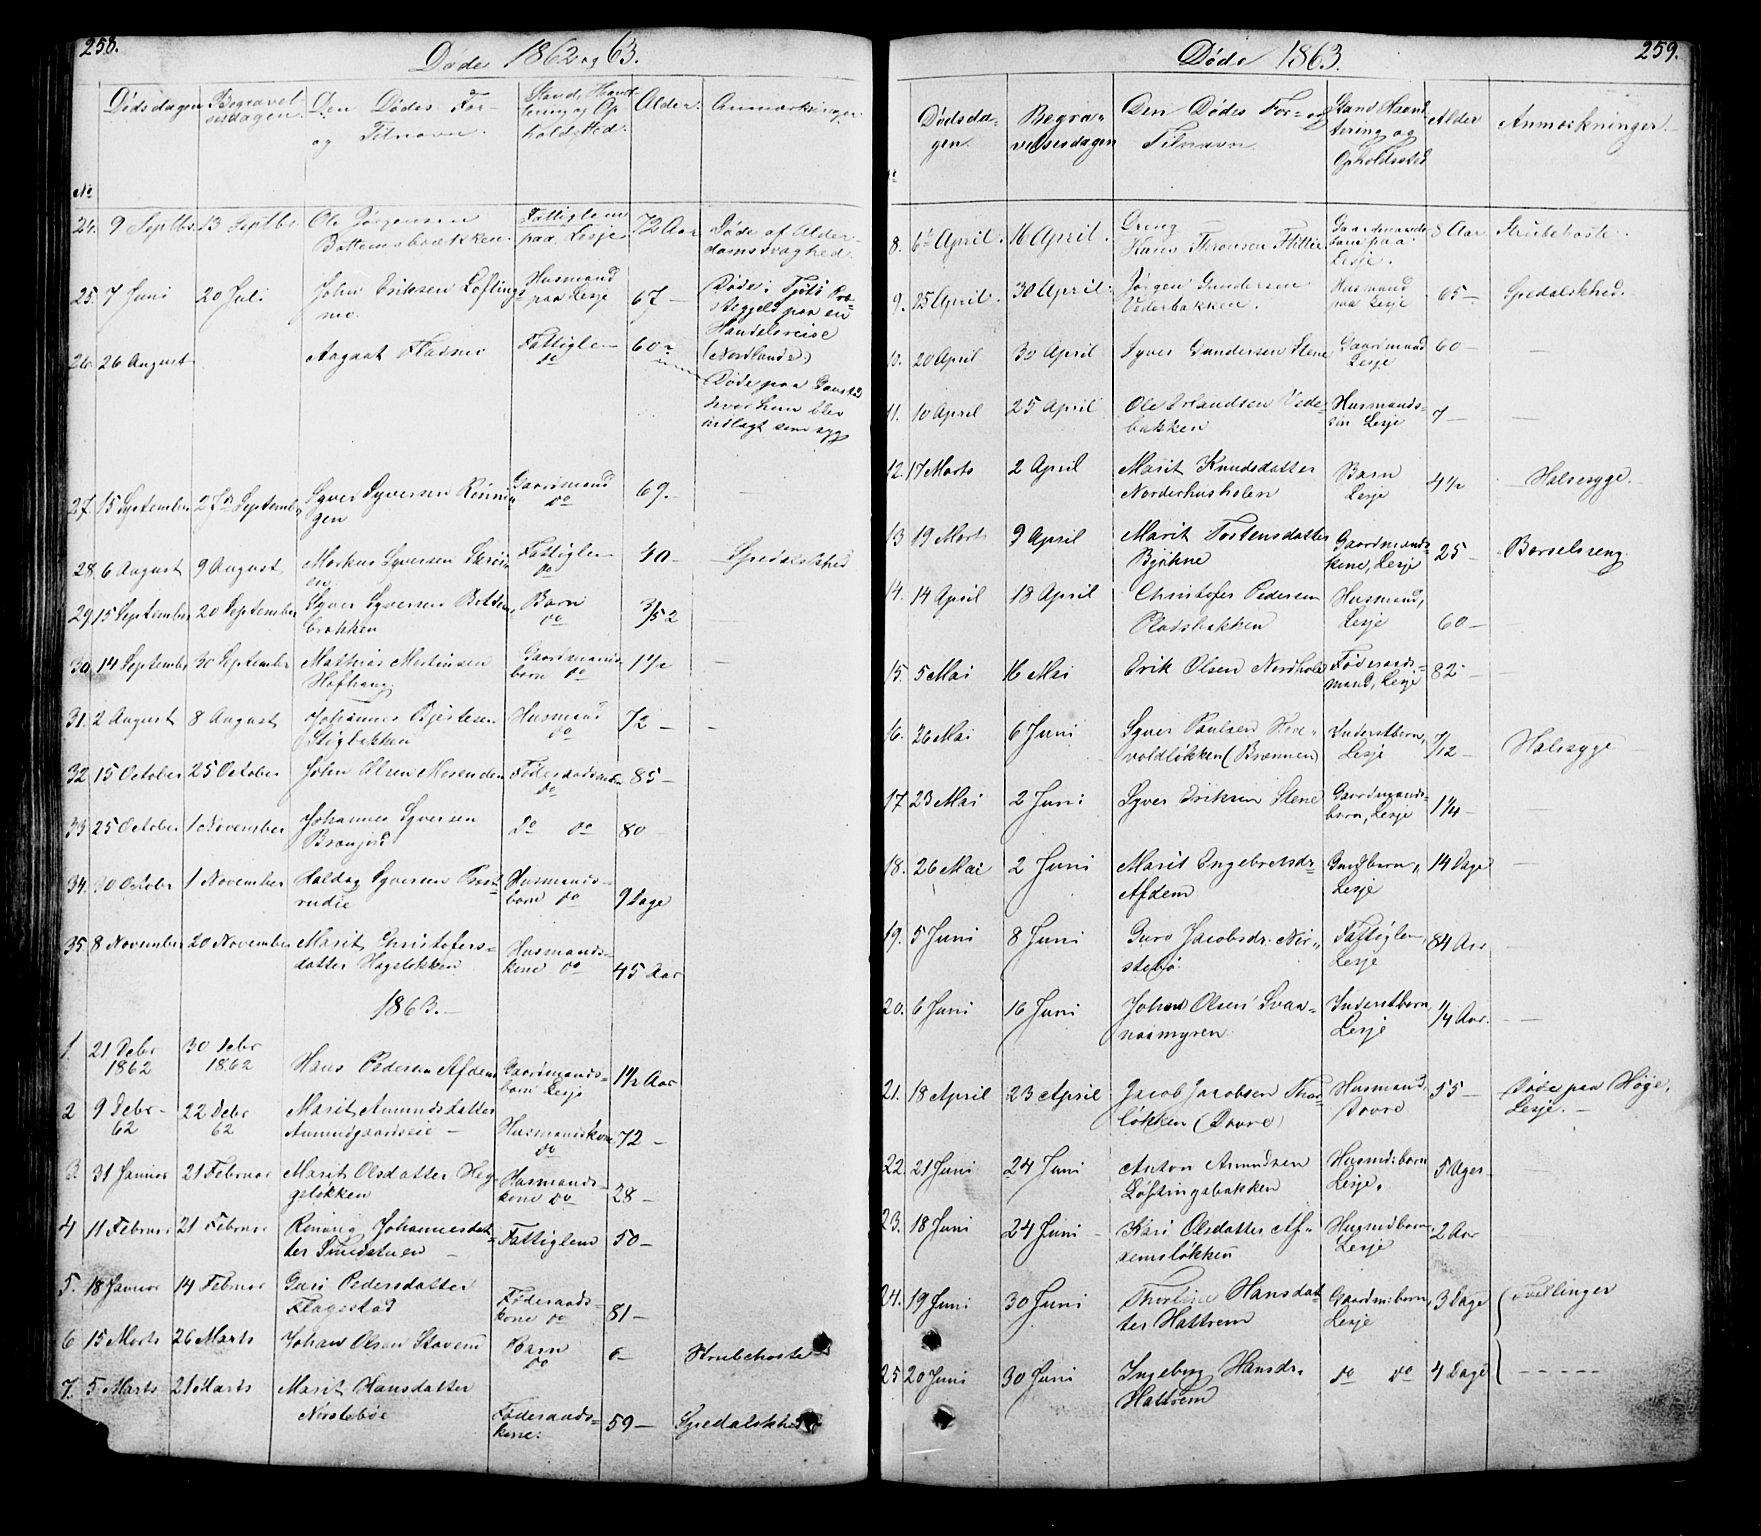 SAH, Lesja prestekontor, Klokkerbok nr. 5, 1850-1894, s. 258-259